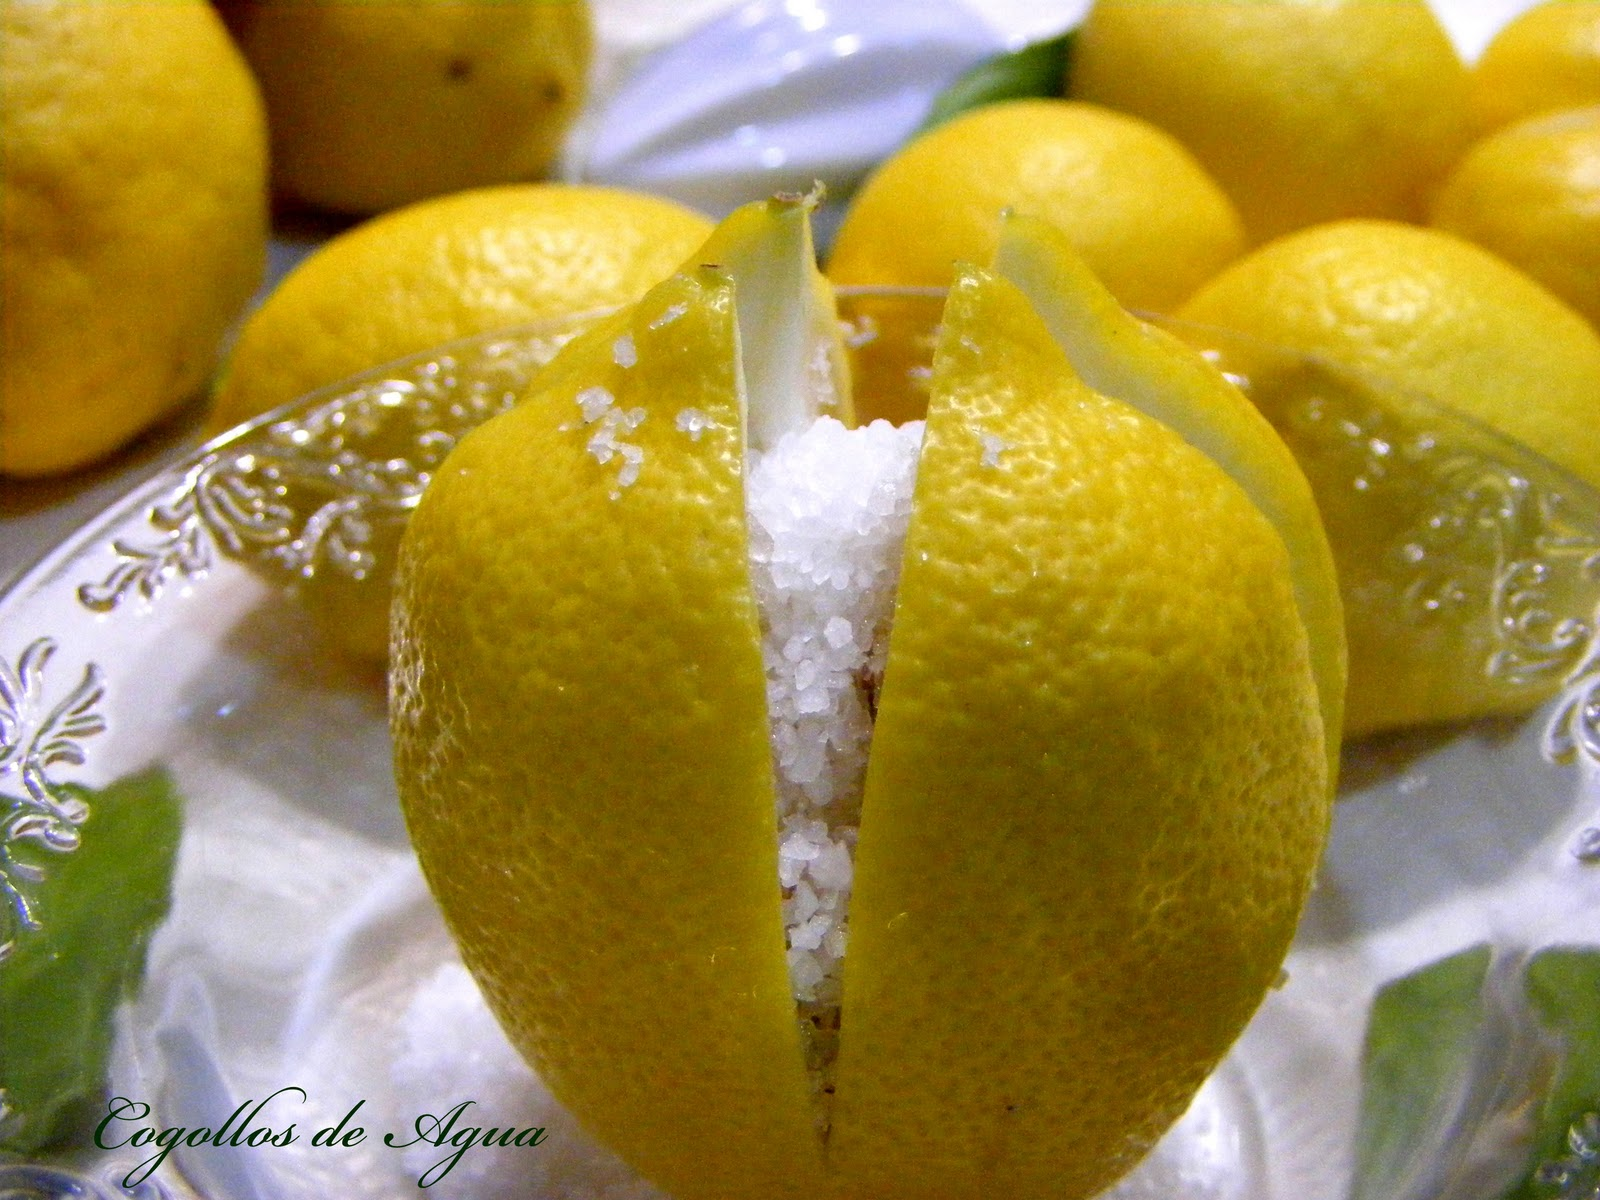 Ngeles amor elimina energias negativas con limones - Limpieza de malas energias ...